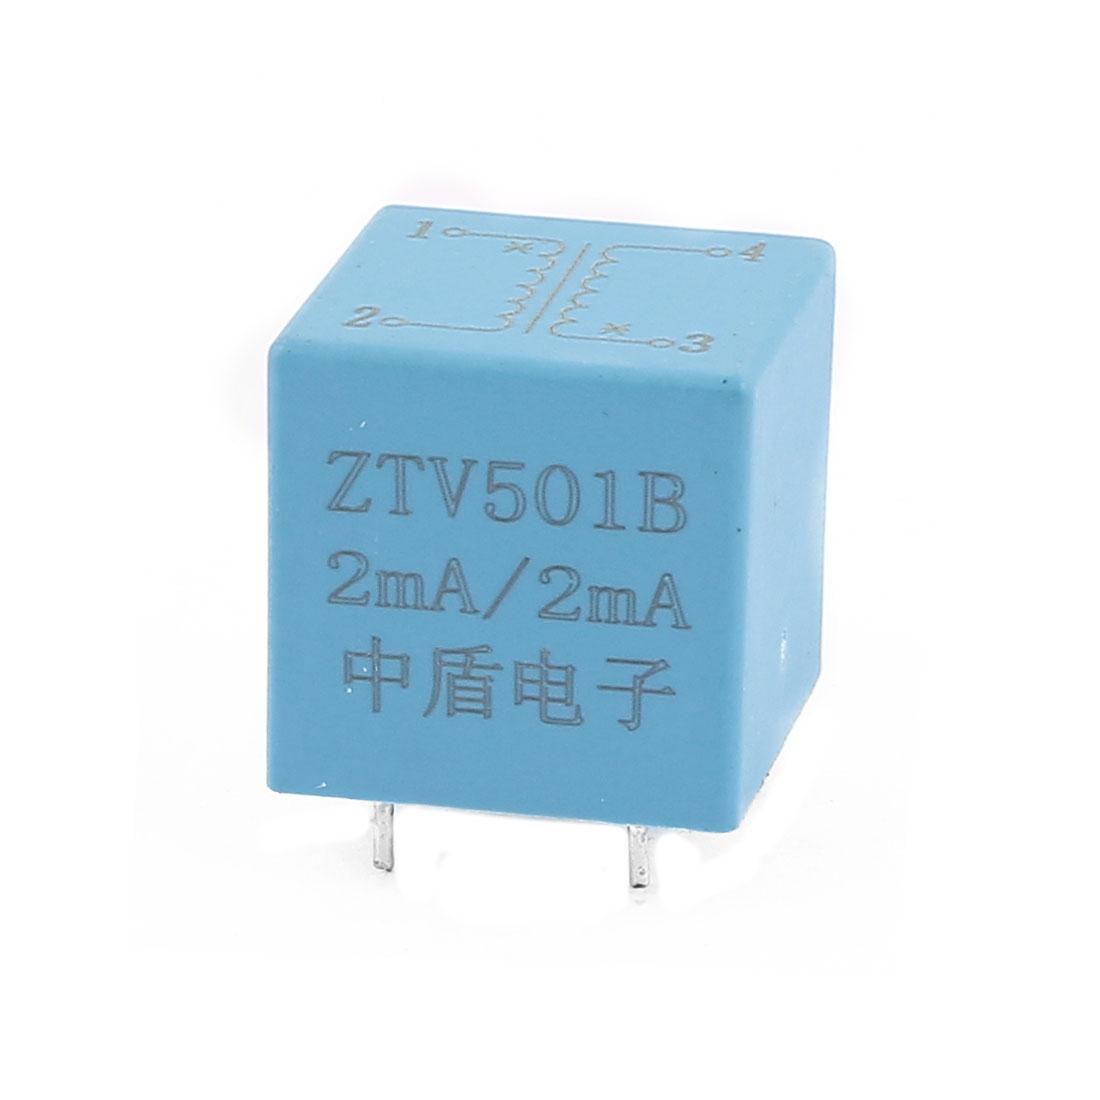 ZTV501B 2mA/2mA 4 Terminal Precision AC Micro Current Transformer Sensor